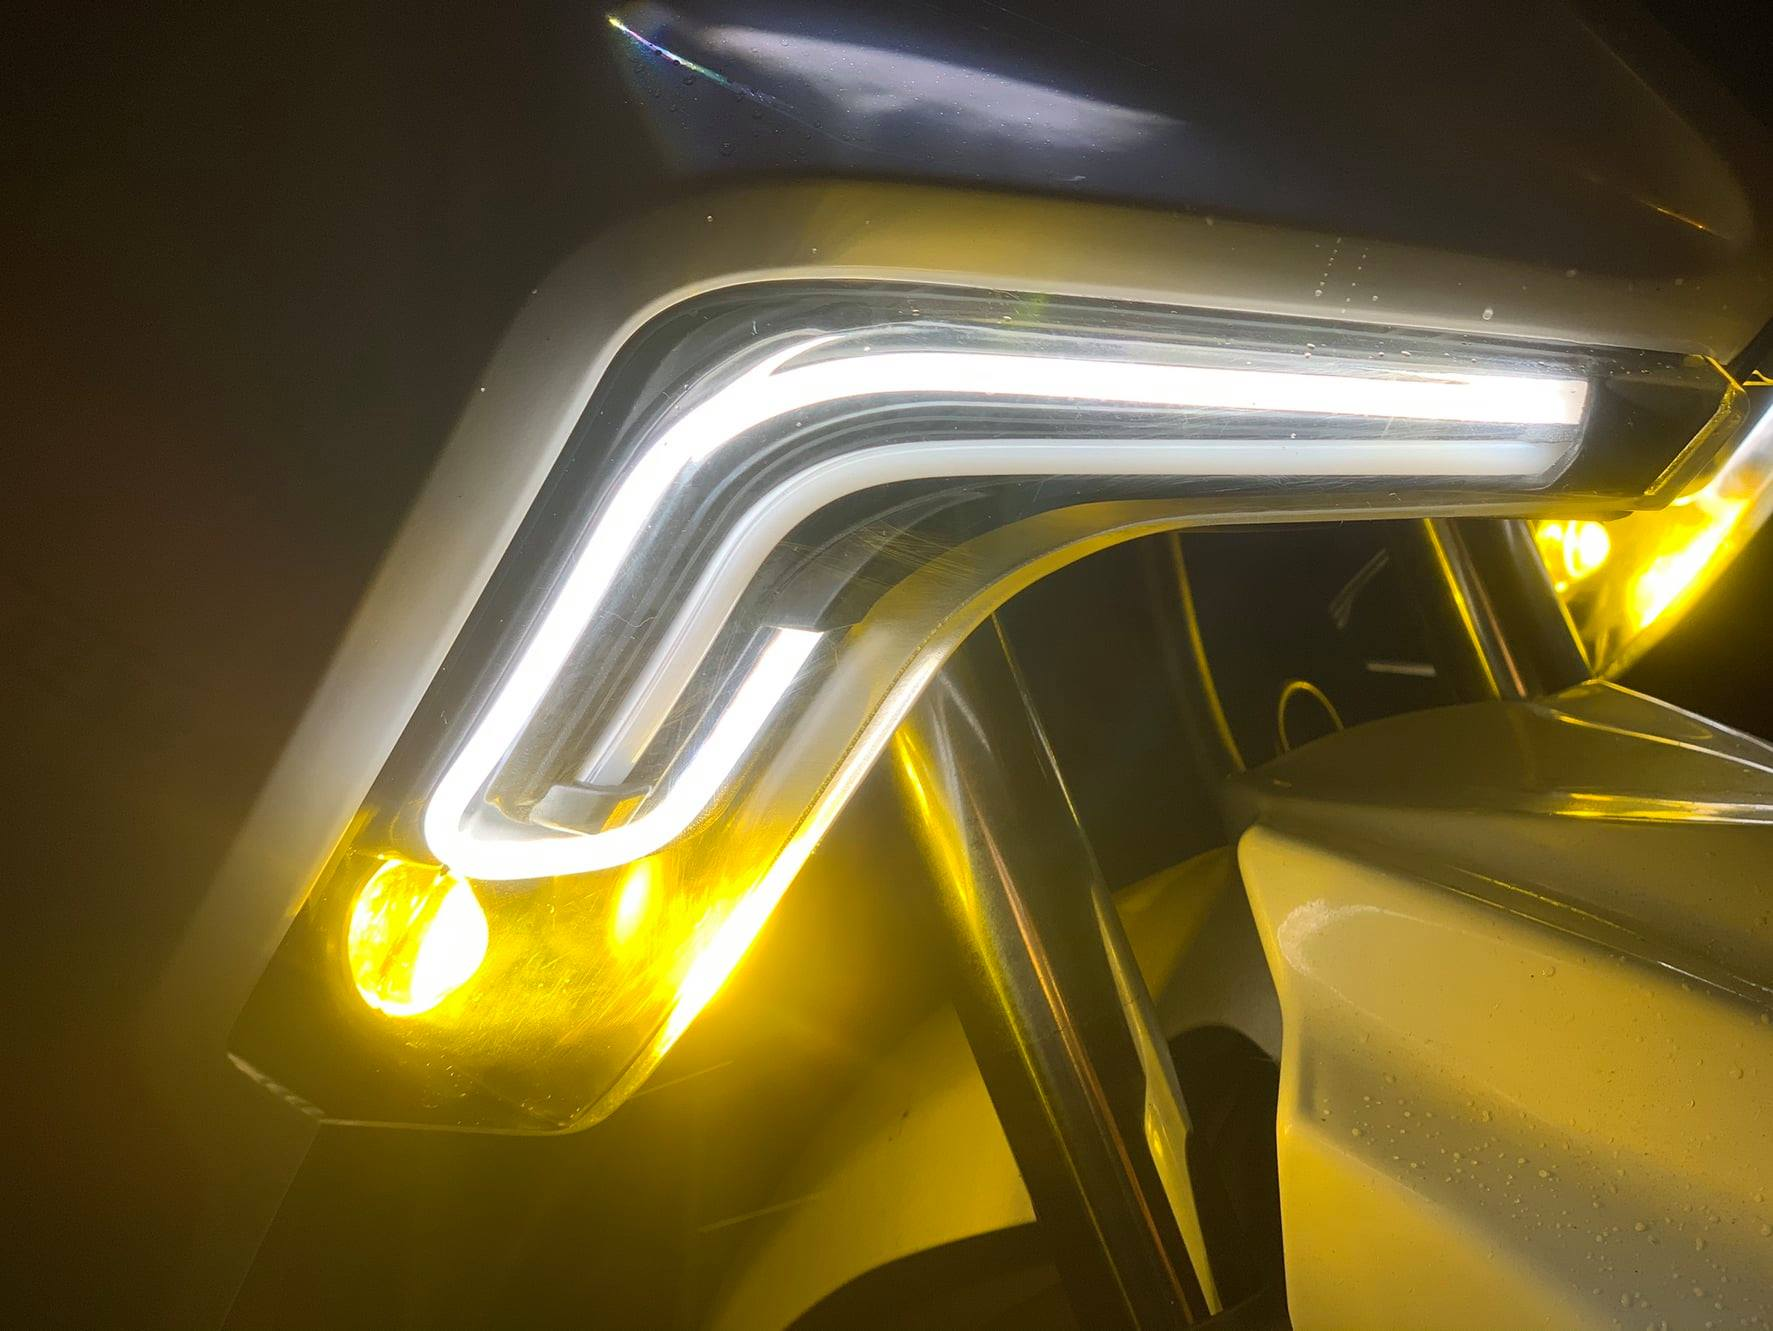 【LFM】CTH DRG D1機械龍 整合方向燈組 含遠近霧燈 DRG158 導光 前方向燈組 日行燈